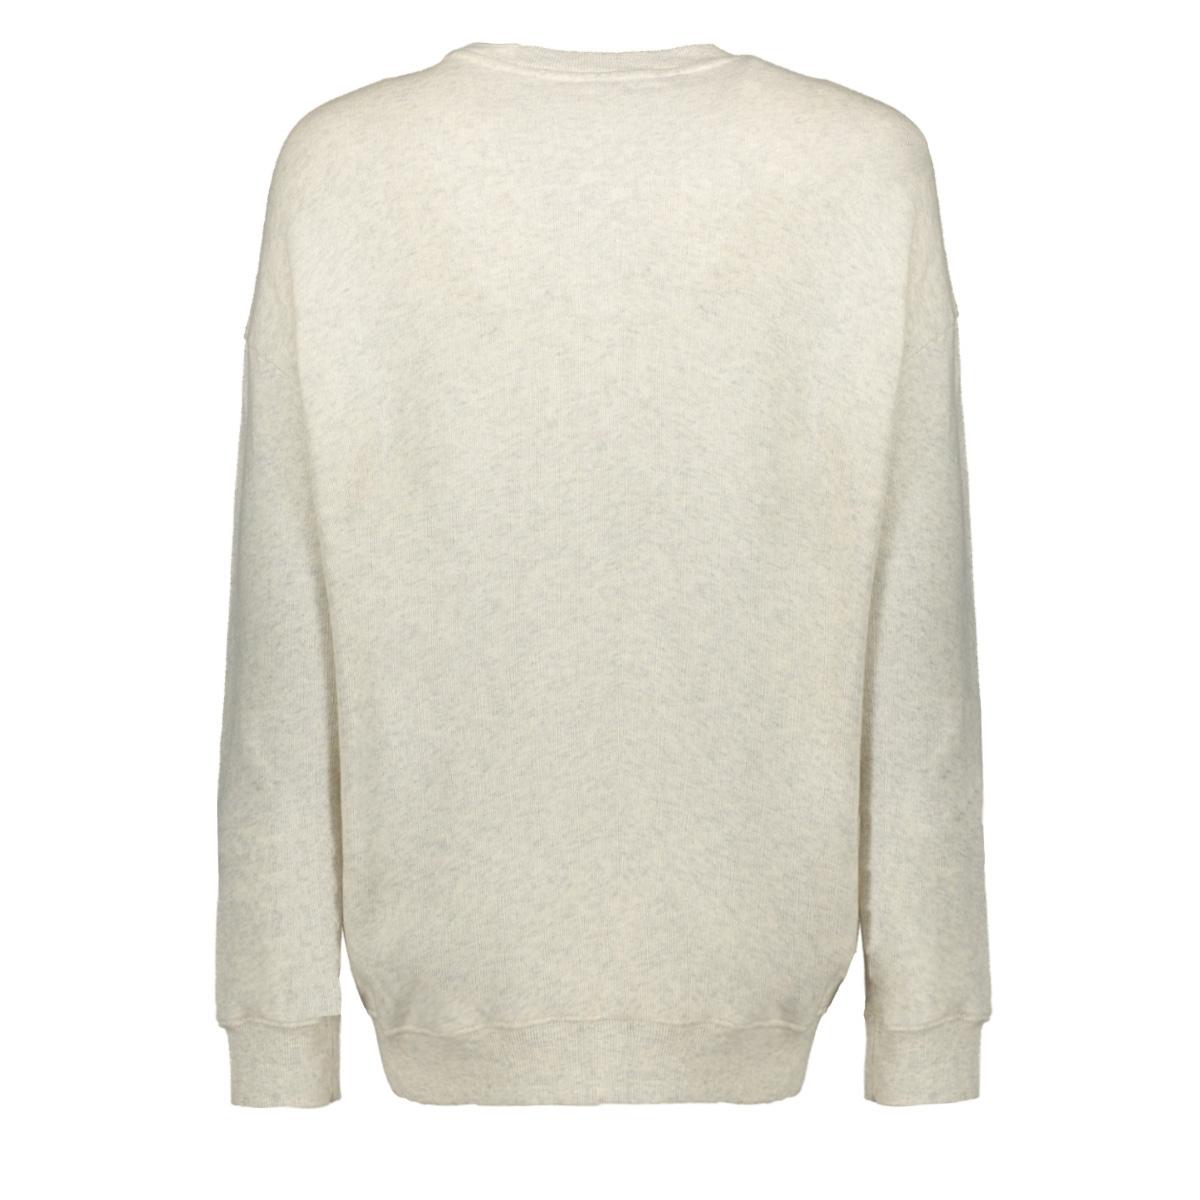 208008103 10 days sweater white wool melee